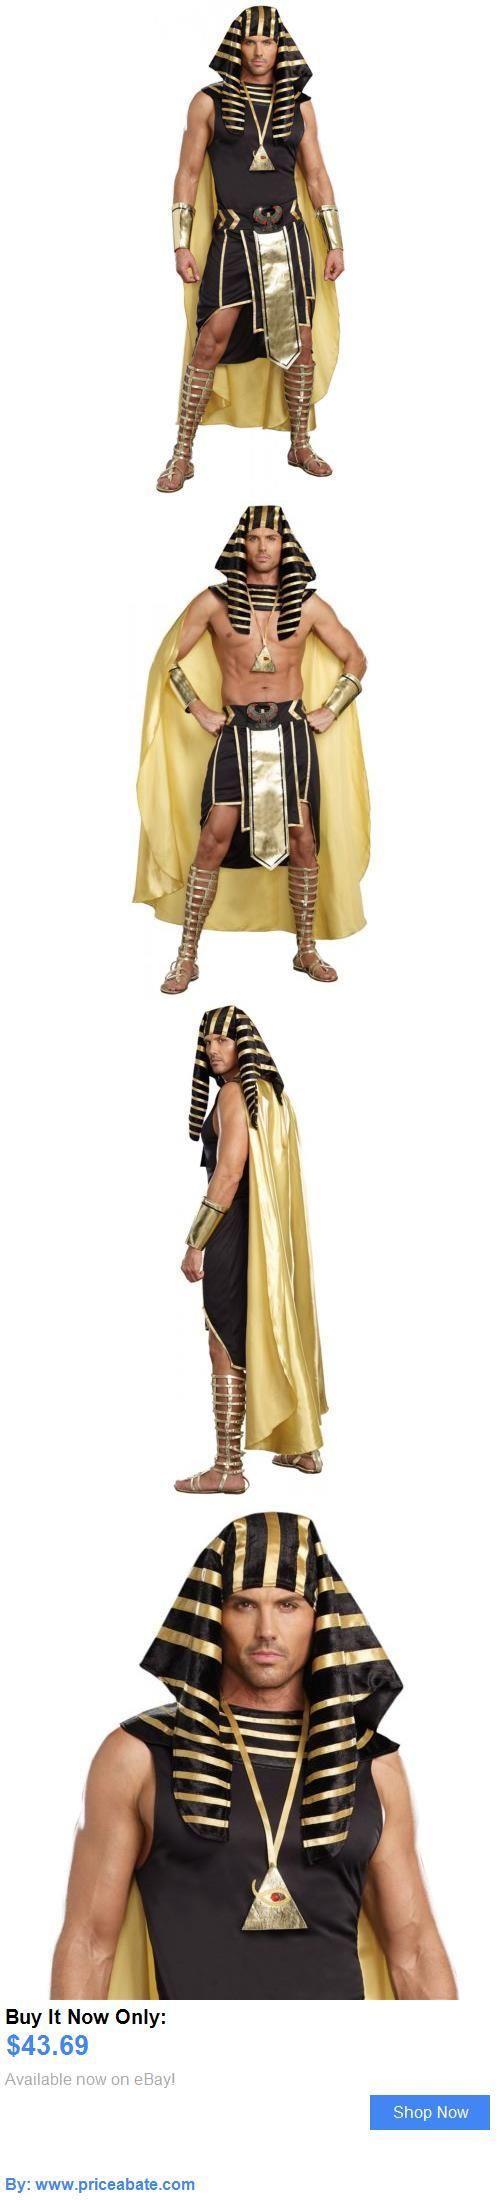 Men Costumes: Egyptian Costume Adult Pharaoh King Tut Halloween Fancy Dress BUY IT NOW ONLY: $43.69 #priceabateMenCostumes OR #priceabate